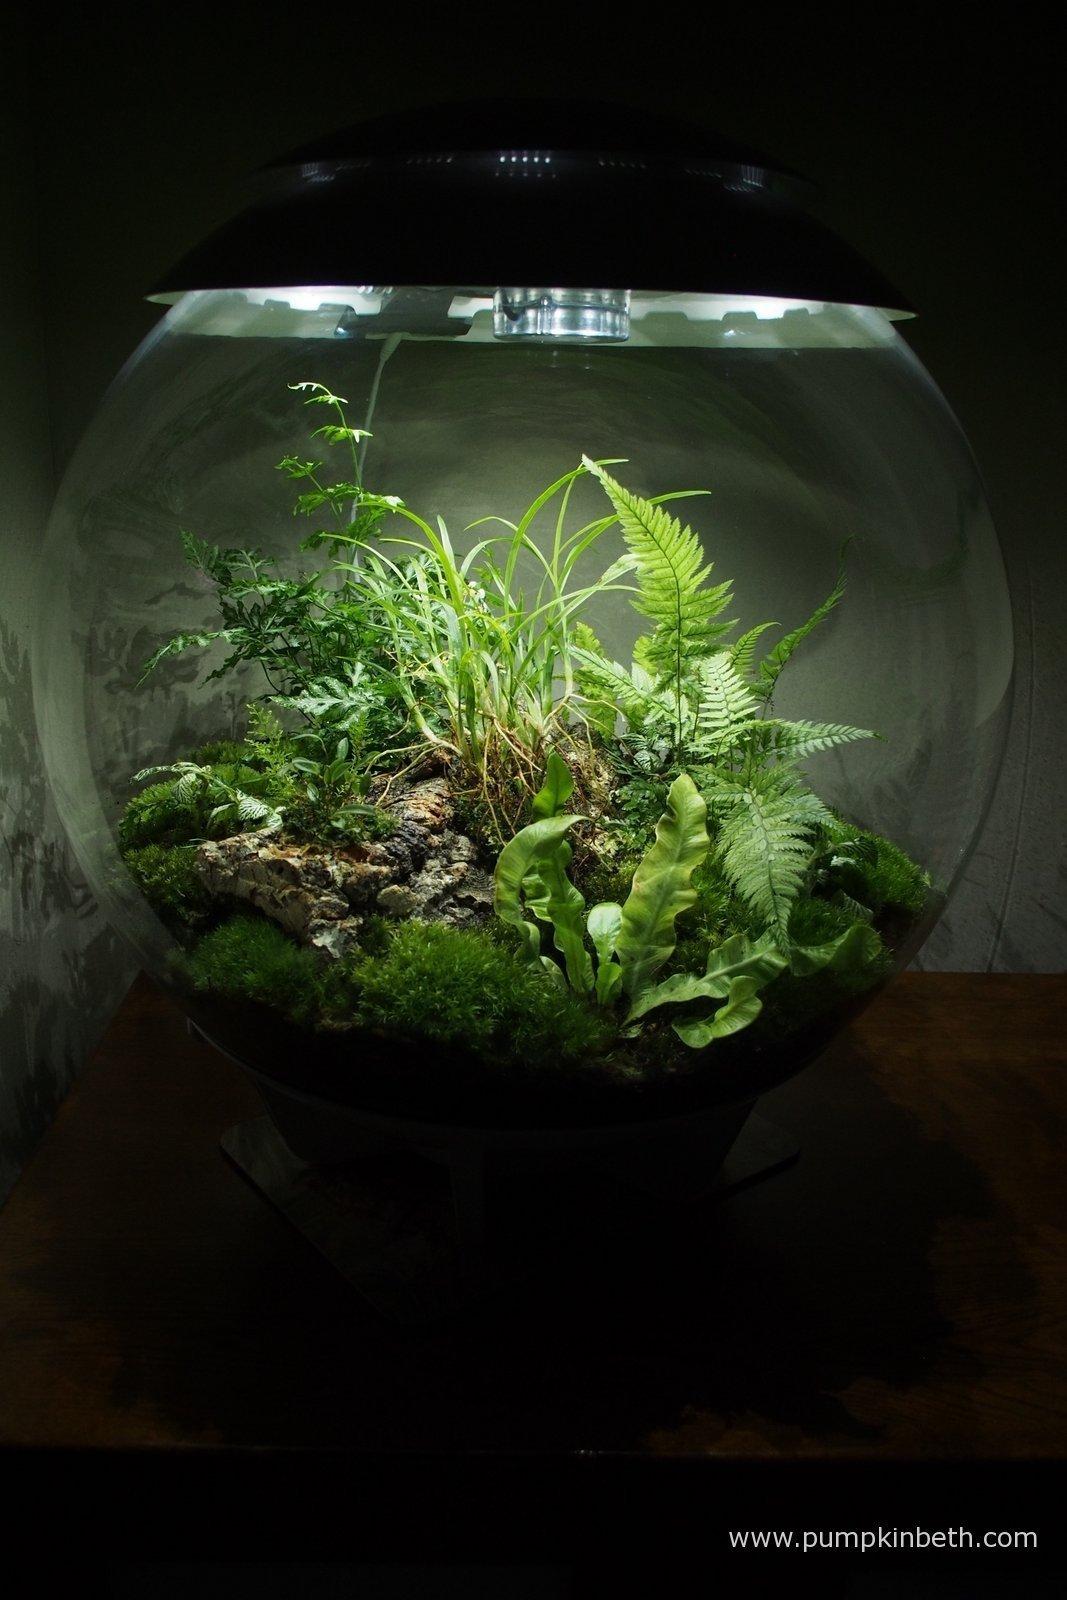 general terrarium maintenance and plant care for the biorbair terrarium pumpkin beth. Black Bedroom Furniture Sets. Home Design Ideas